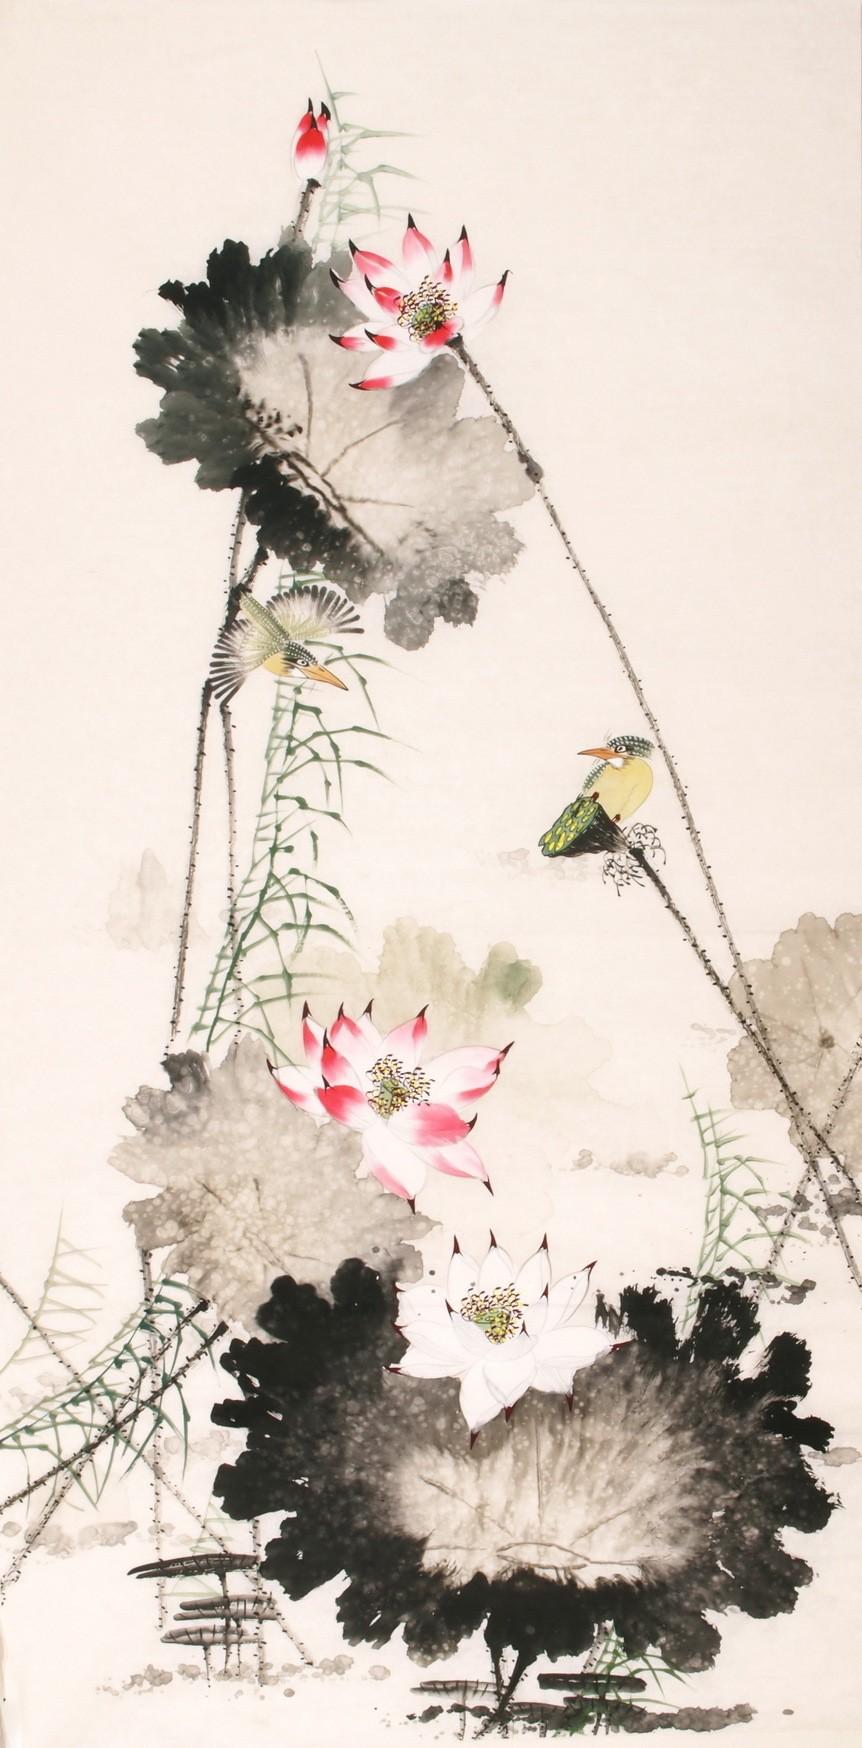 Kingfisher - CNAG000418